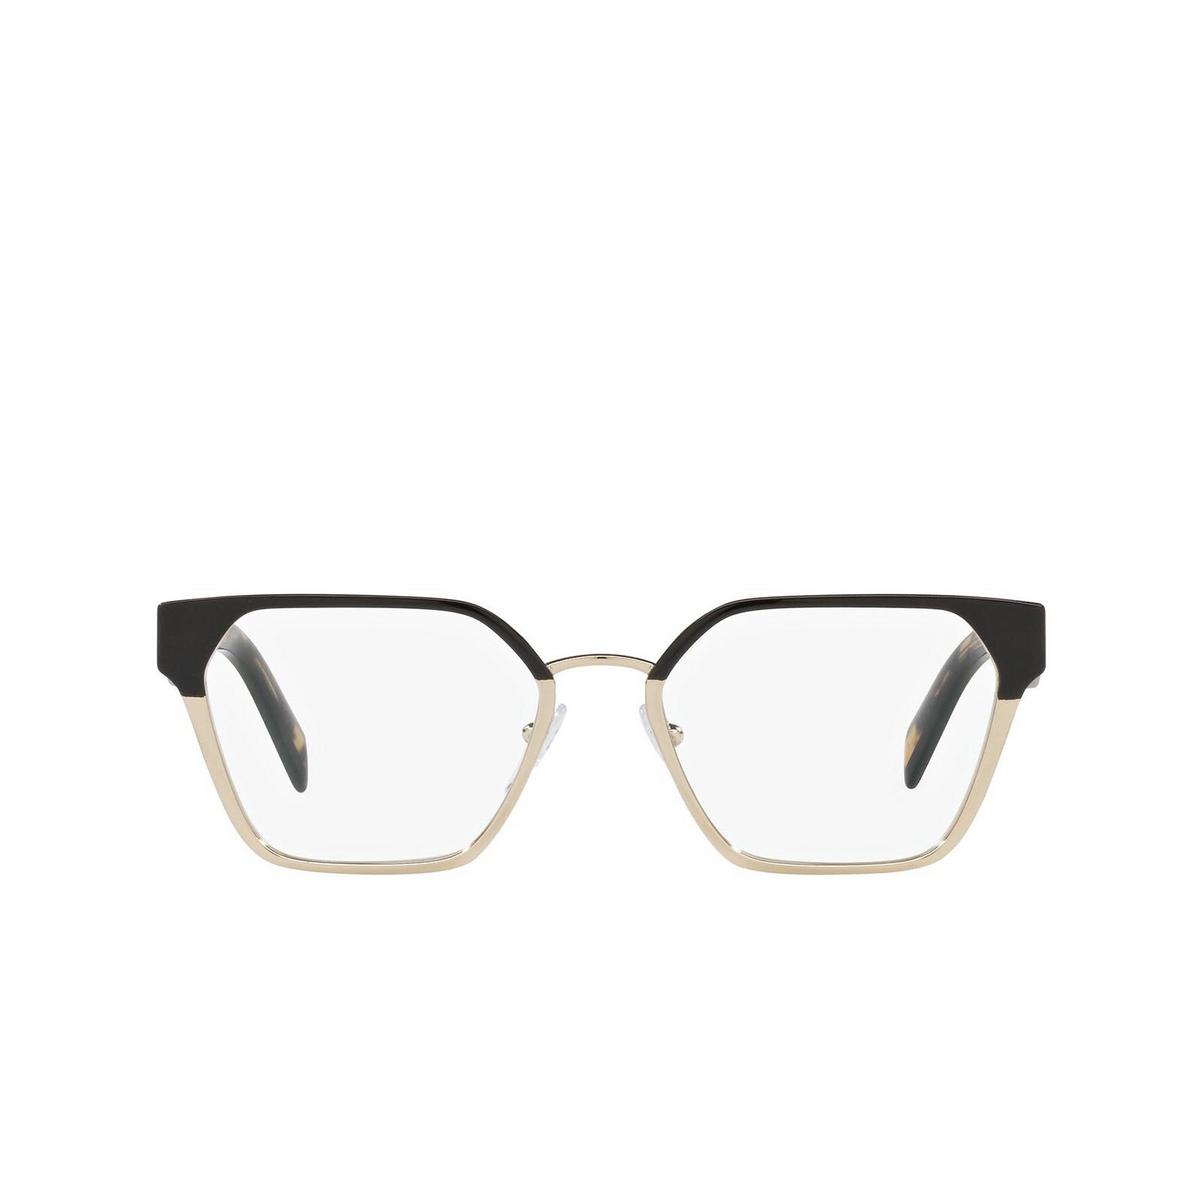 Prada® Irregular Eyeglasses: PR 63WV color Black/pale Gold AAV1O1.